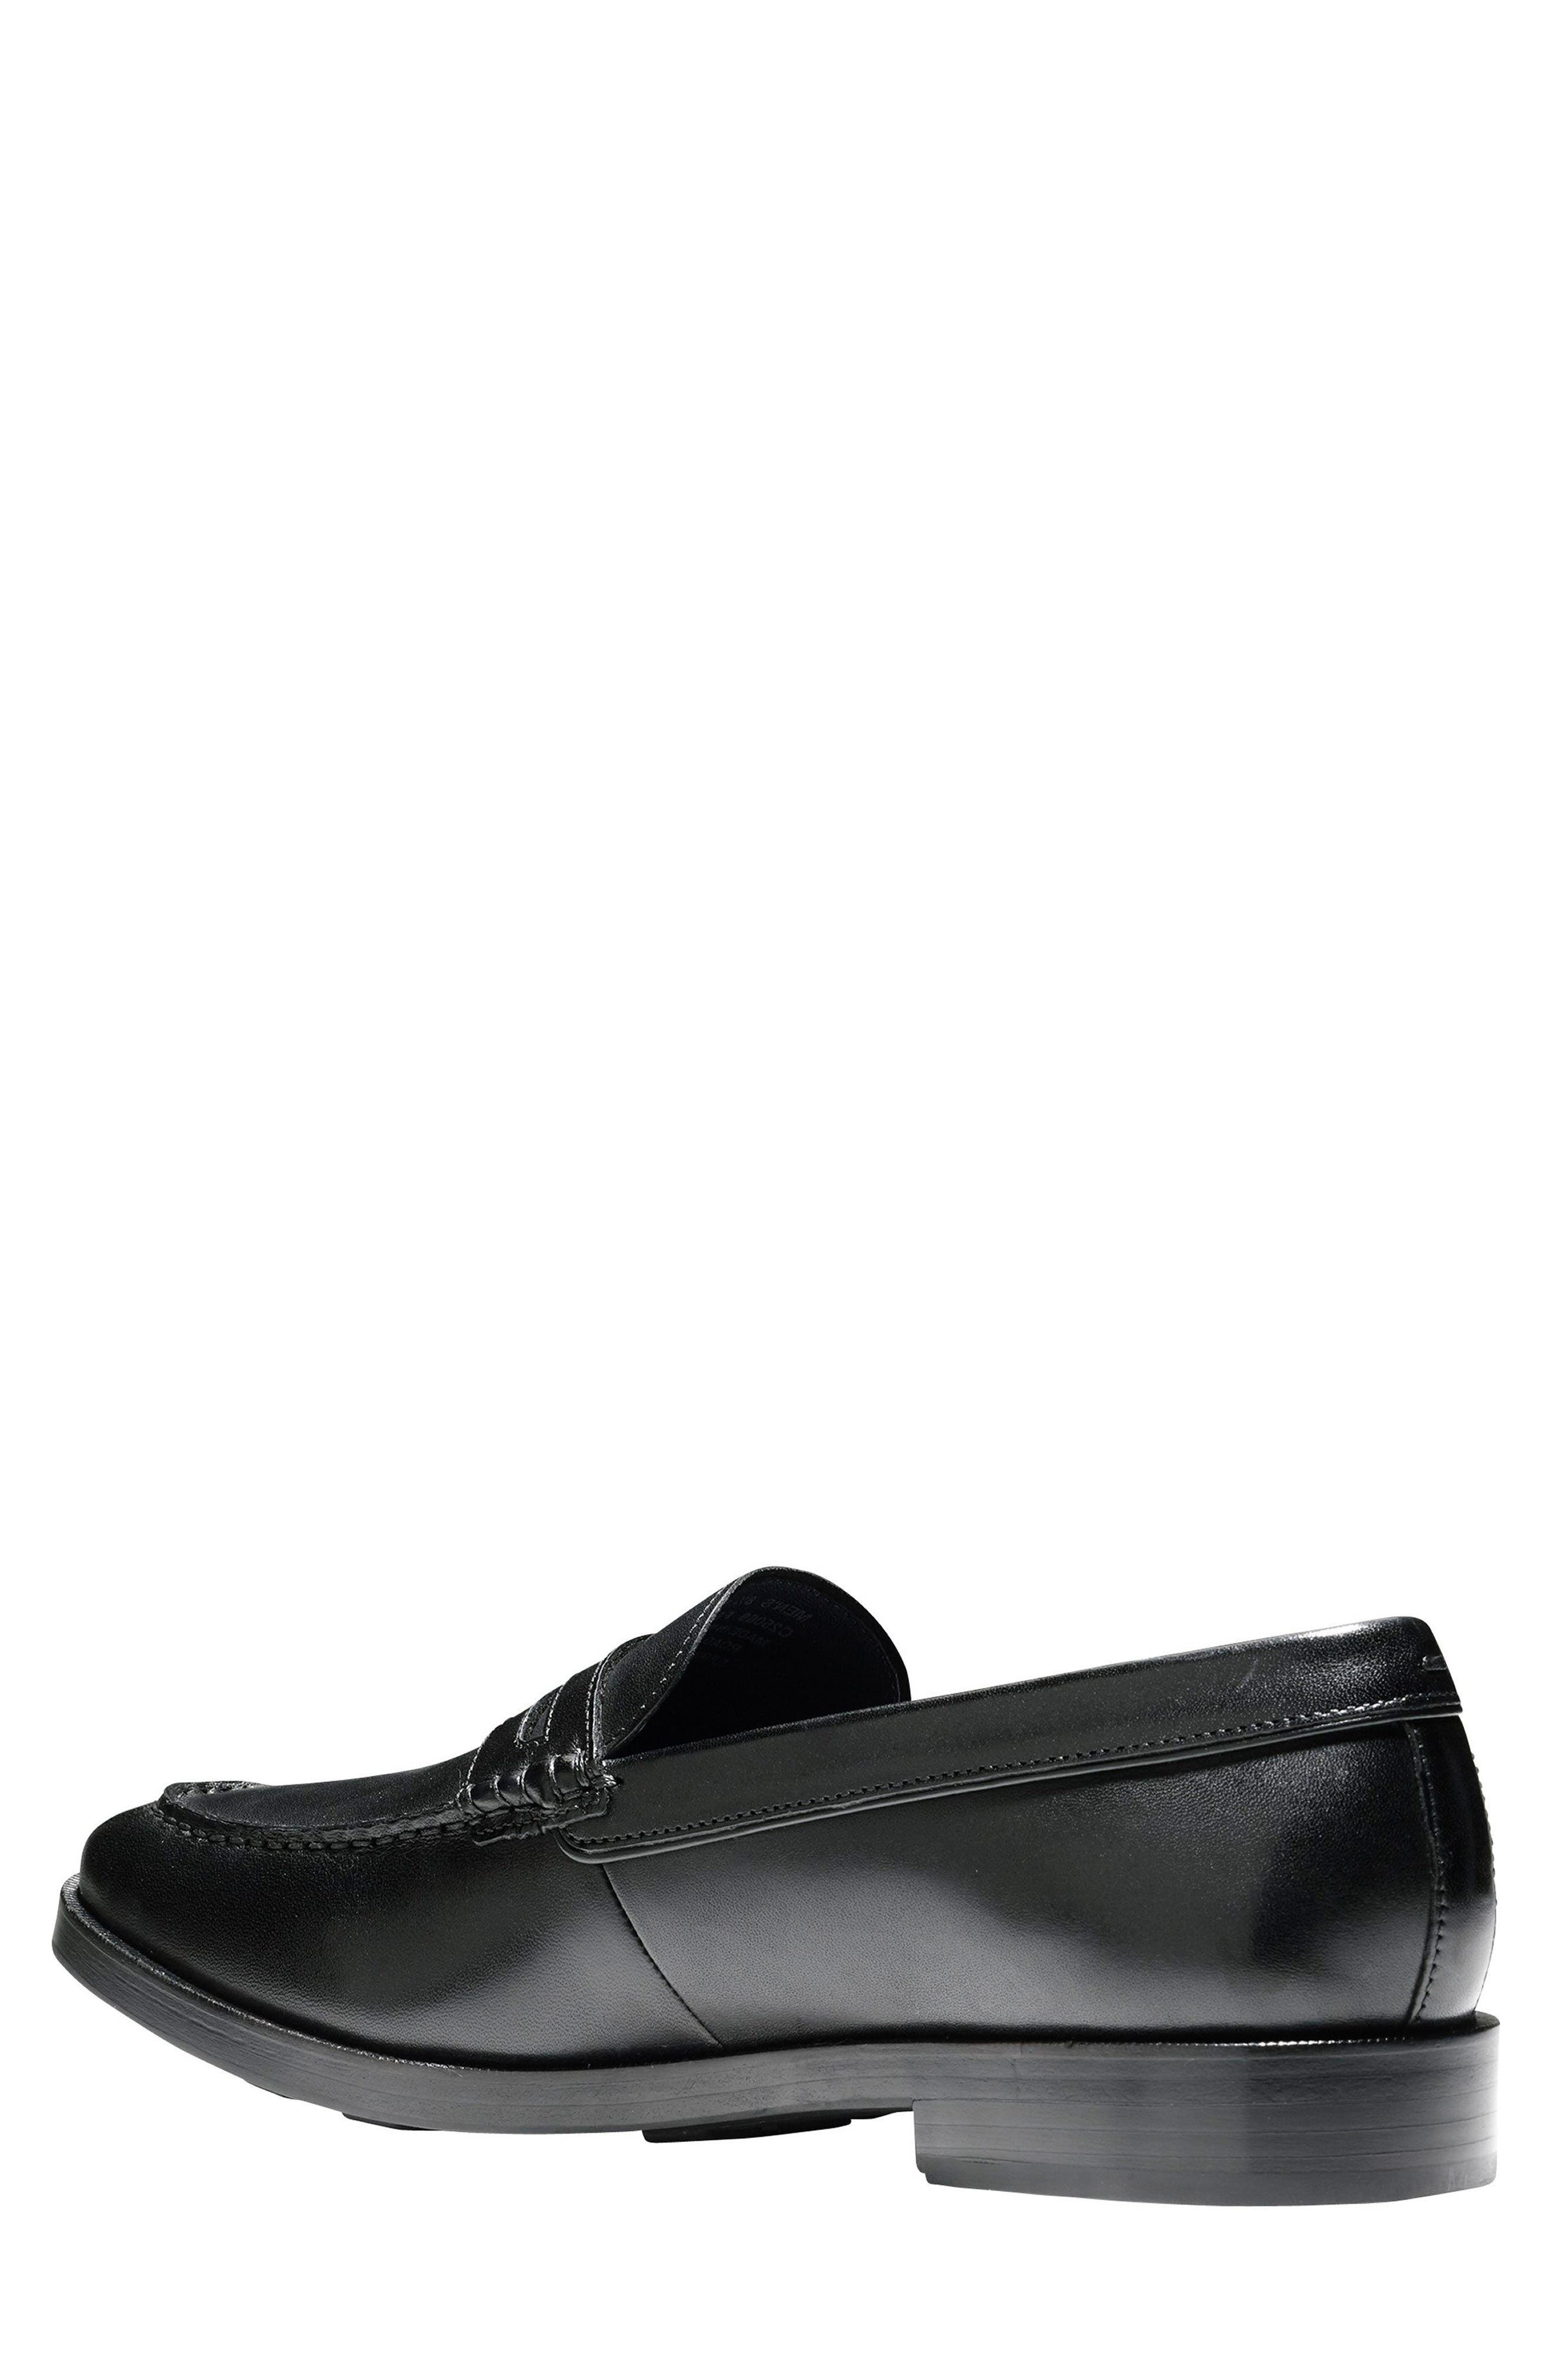 Hamilton Grand Penny Loafer,                             Alternate thumbnail 2, color,                             Black Leather